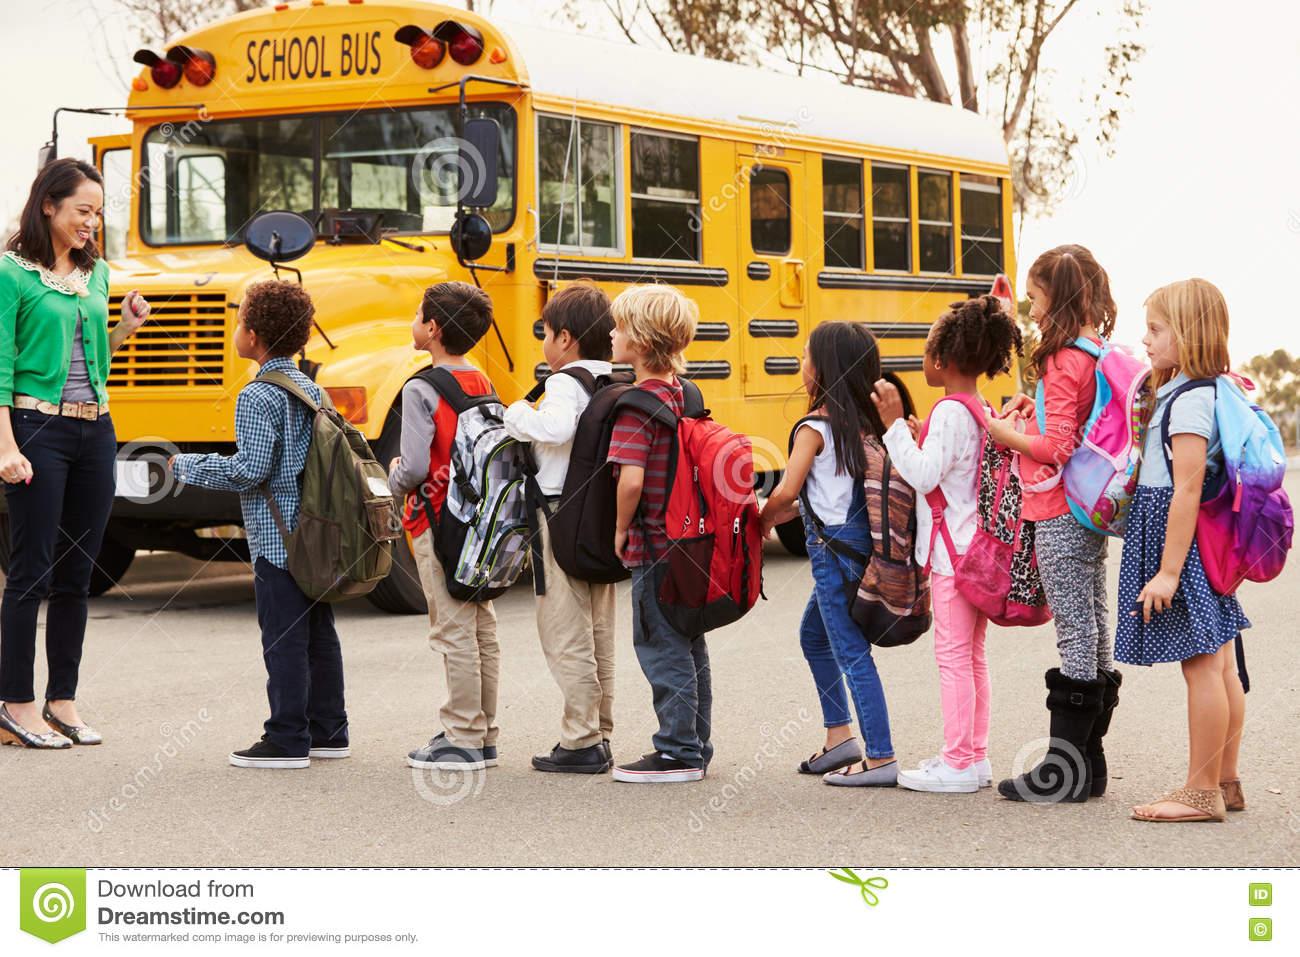 teacher-group-elementary-school-kids-bus-stop-71526884